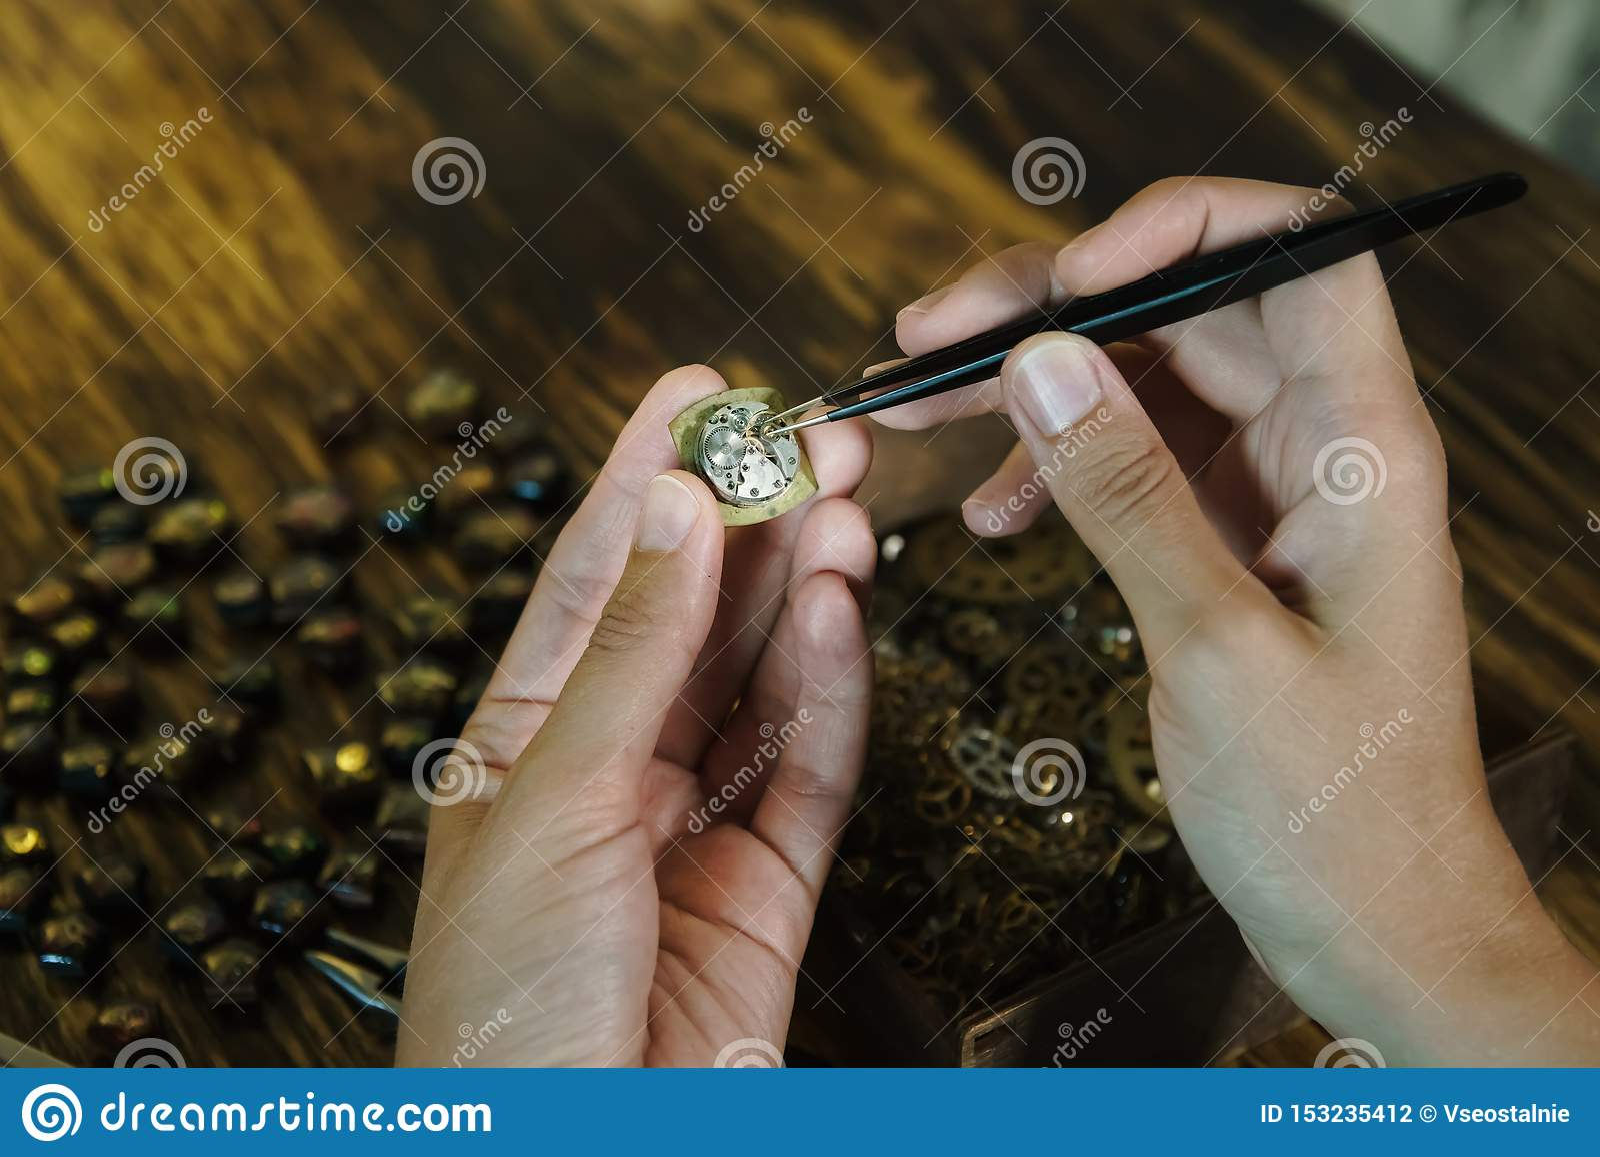 Girl craftsman dismantles watches at workspace